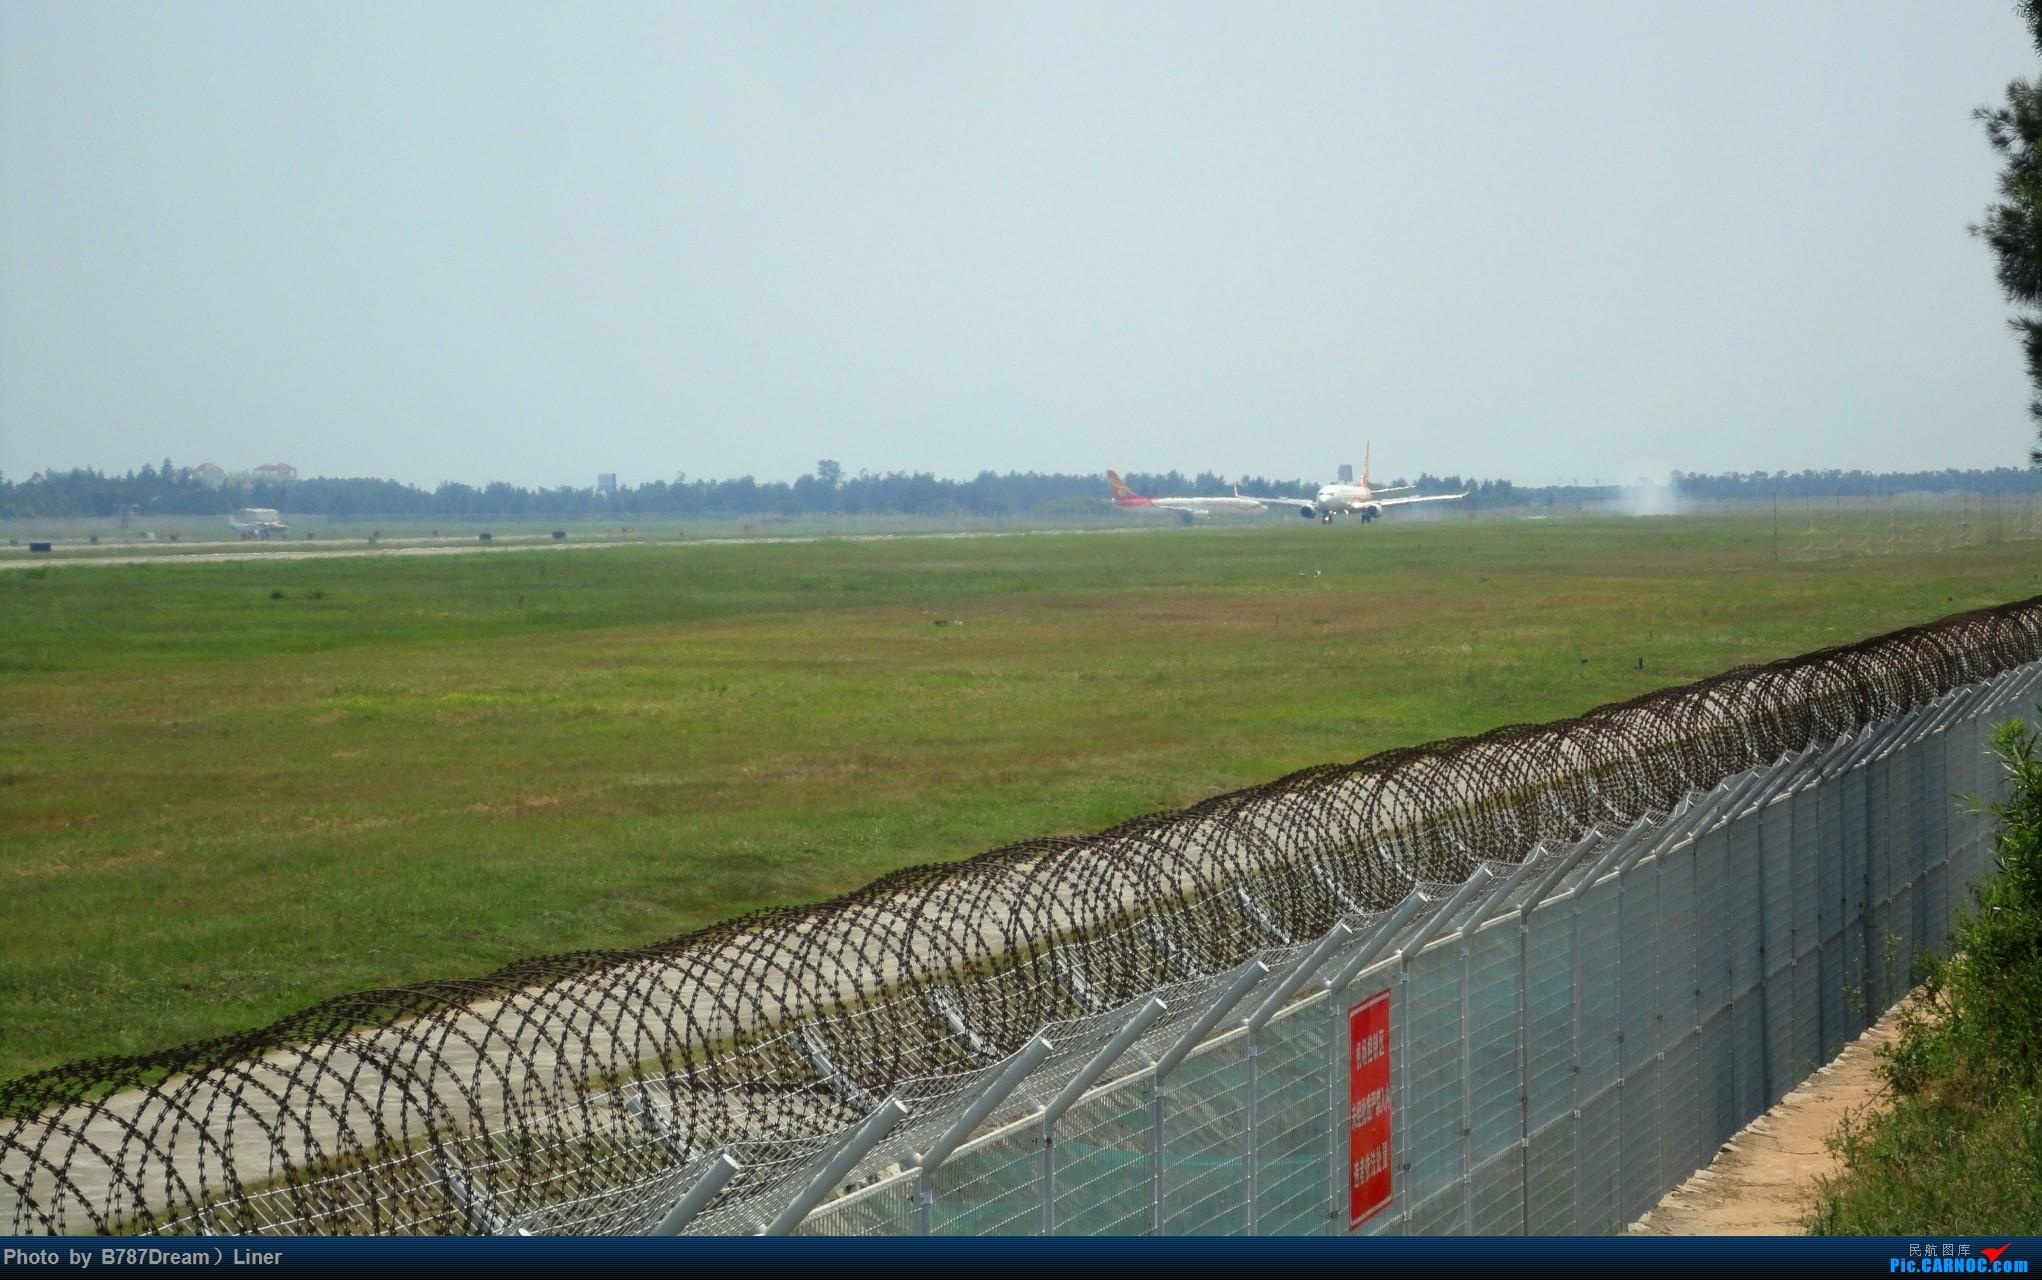 Re:[原创]【福州飞友会】2015.8.2打机 BOEING 737-800 B-5713 中国福州长乐国际机场